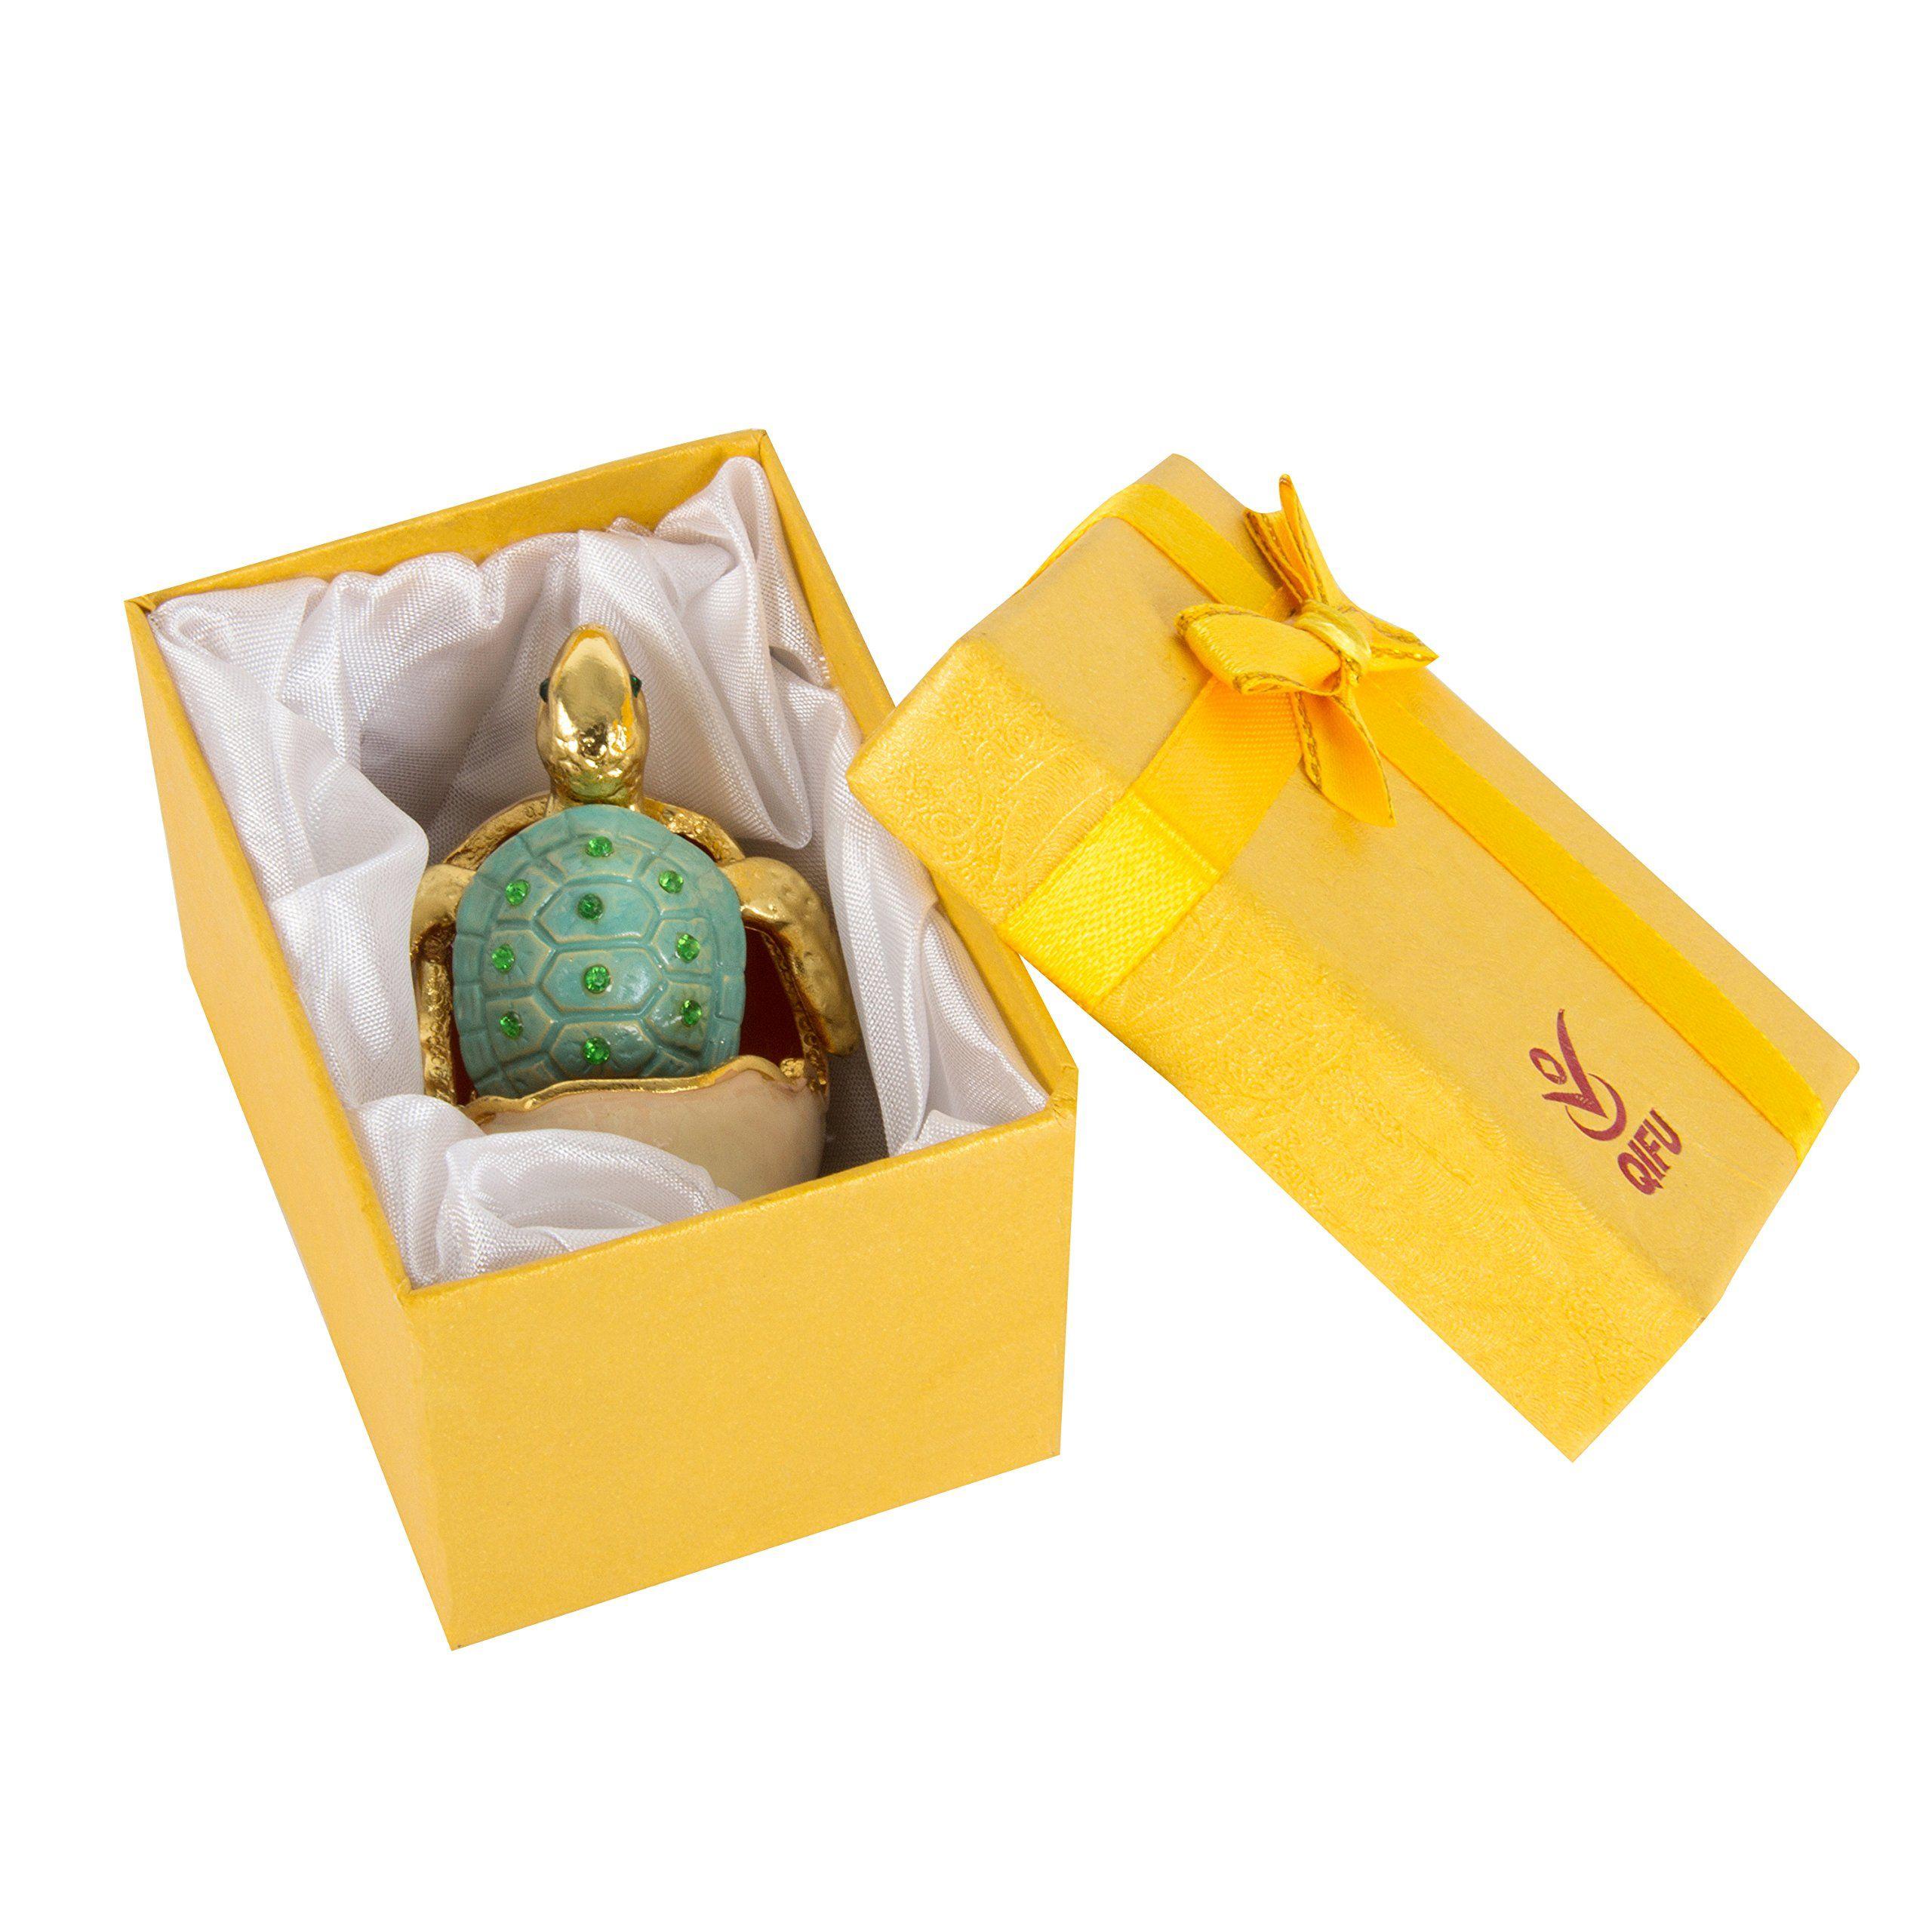 Qifuhand painted sea turtle tortoise decorative hinged